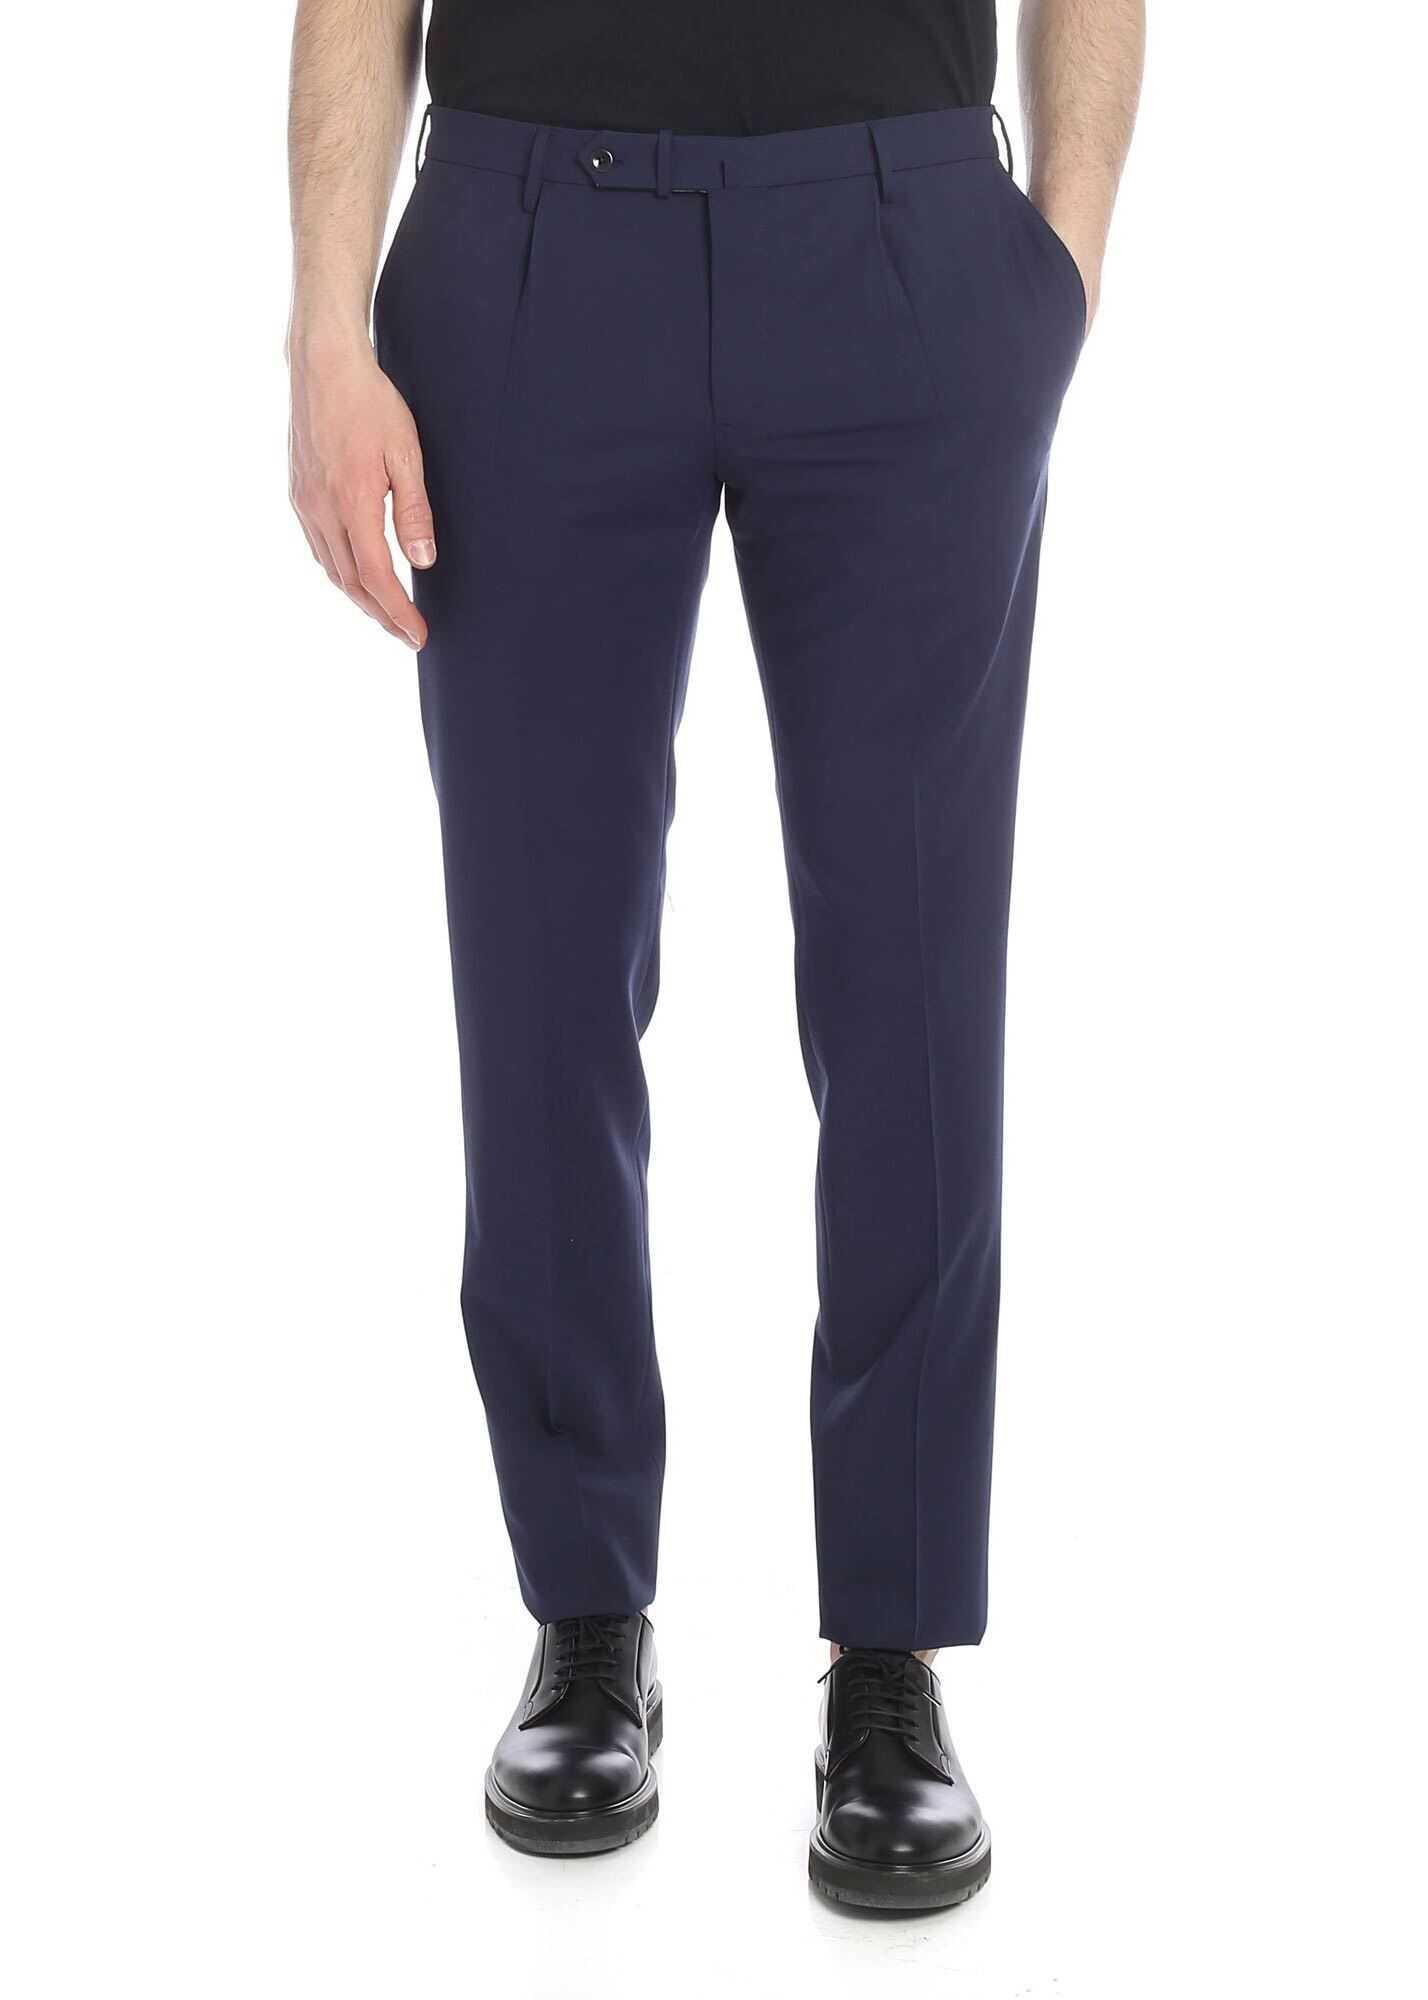 Incotex Blue Trousers With Slit Pockets Blue imagine